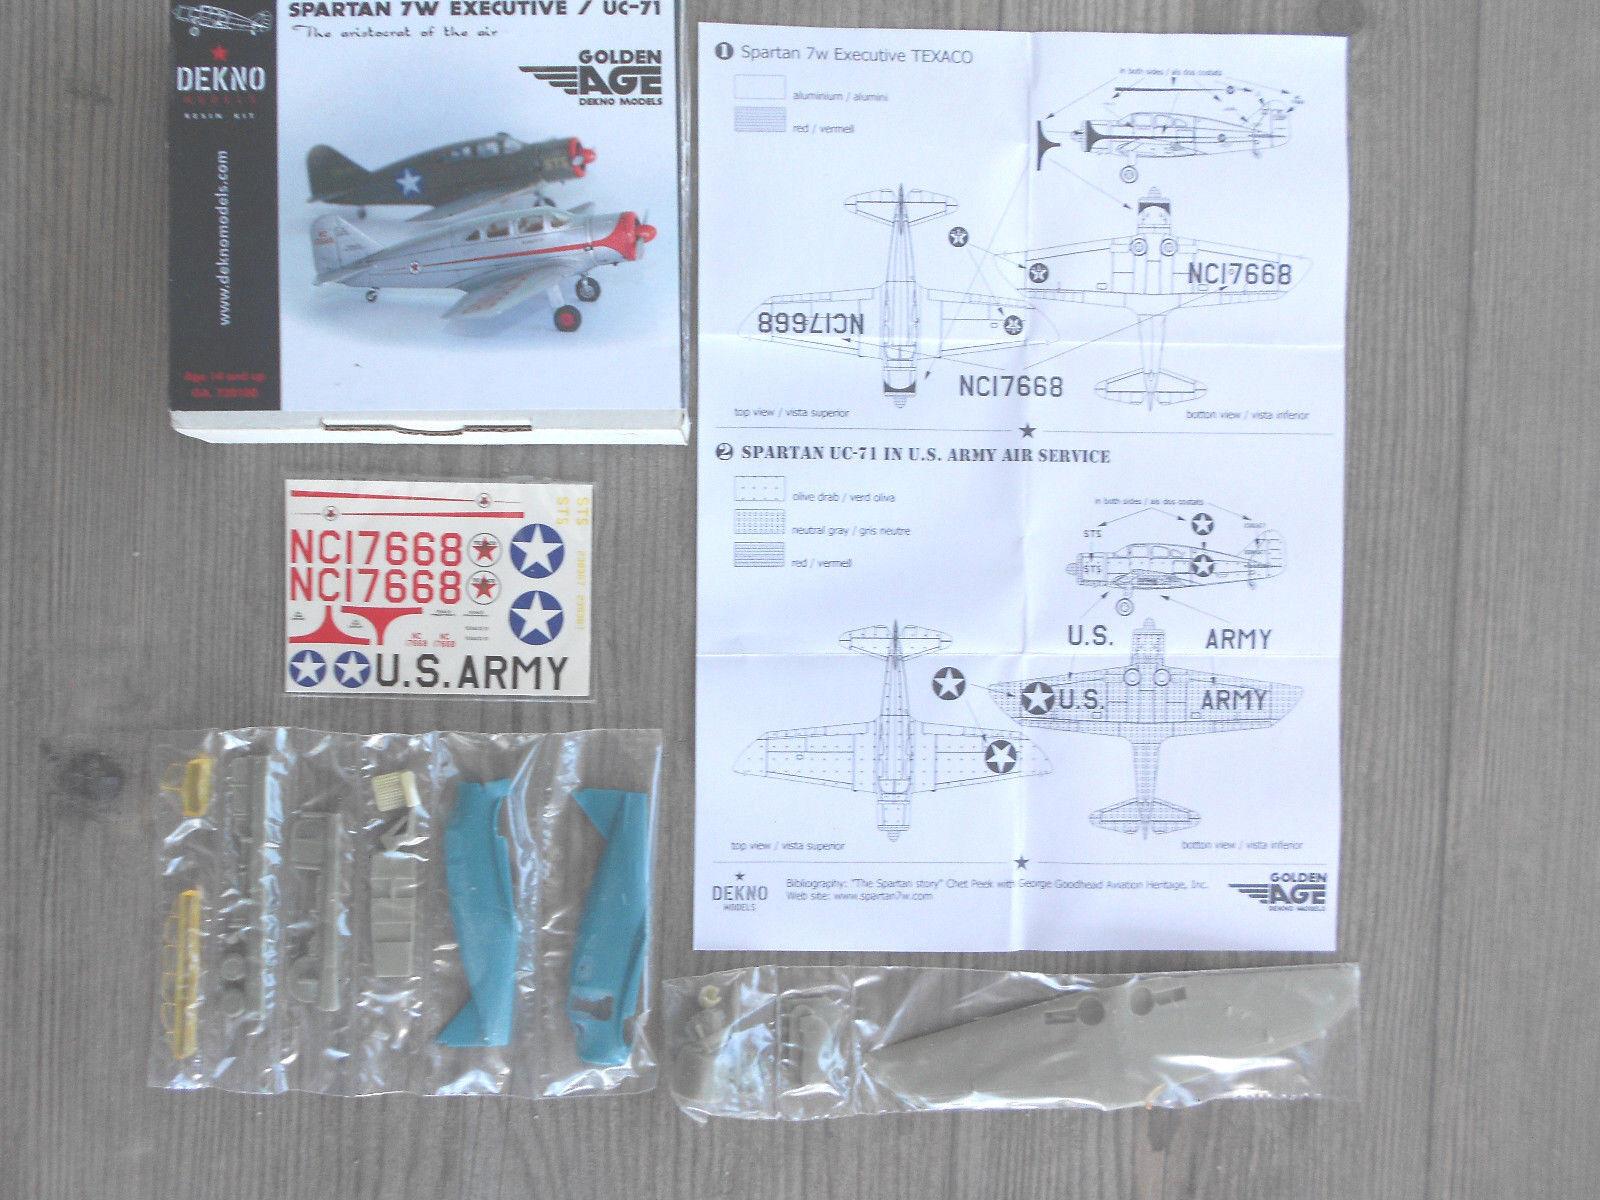 SPARTAN 7W EXECUTIVE UC-71  TEXACO USARMY  DEKNO MODELS RESIN 1 72